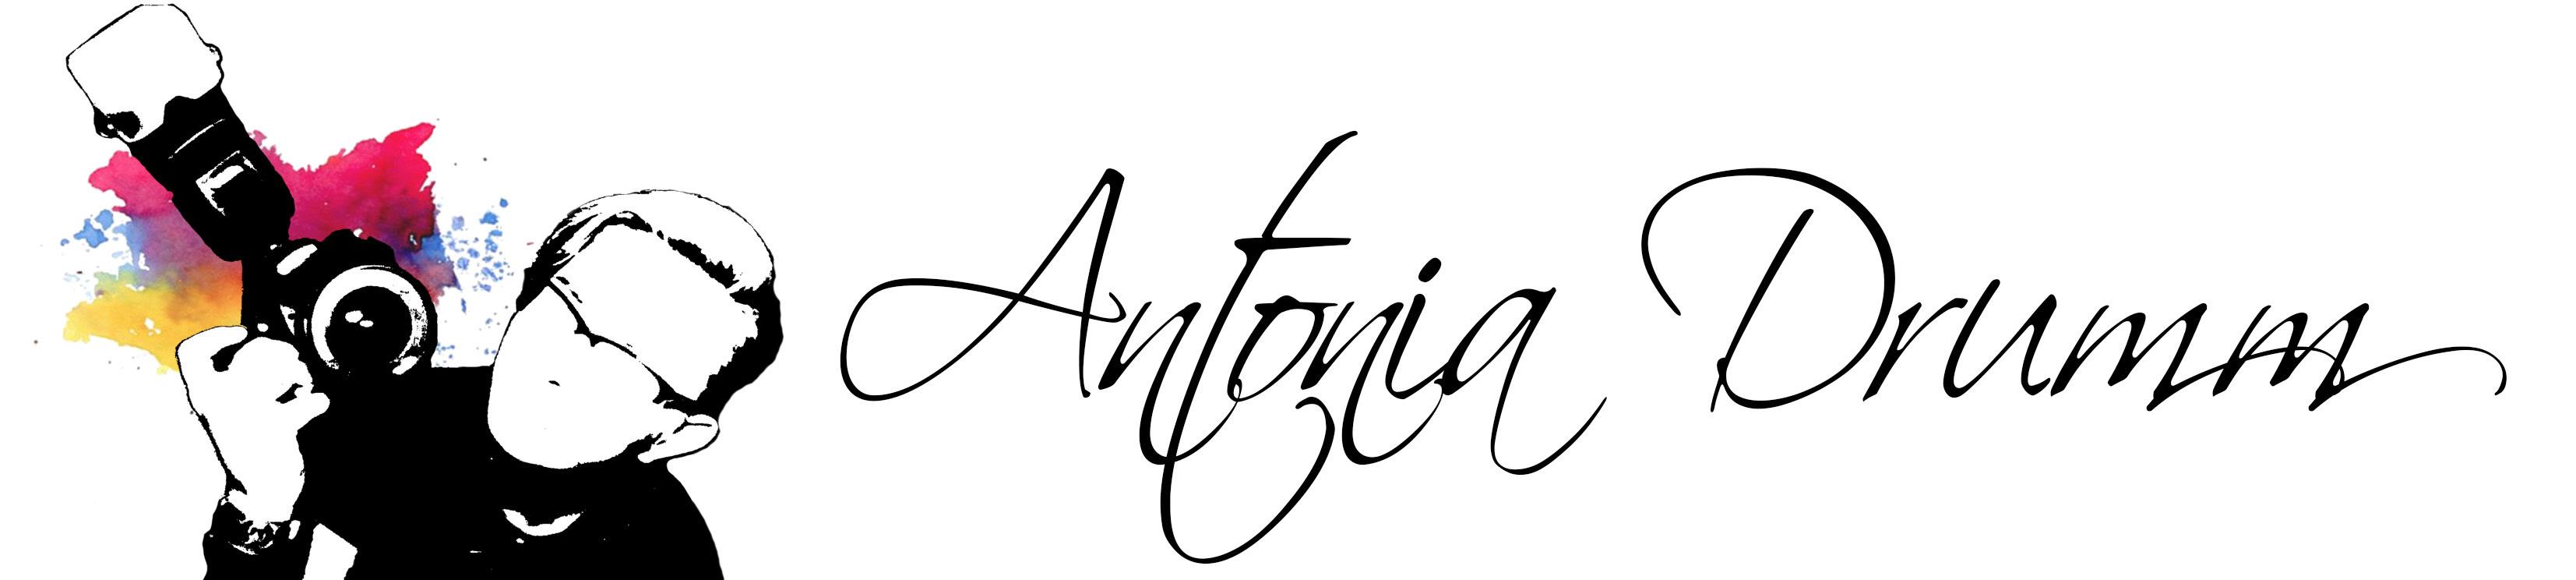 Antonia Drumm